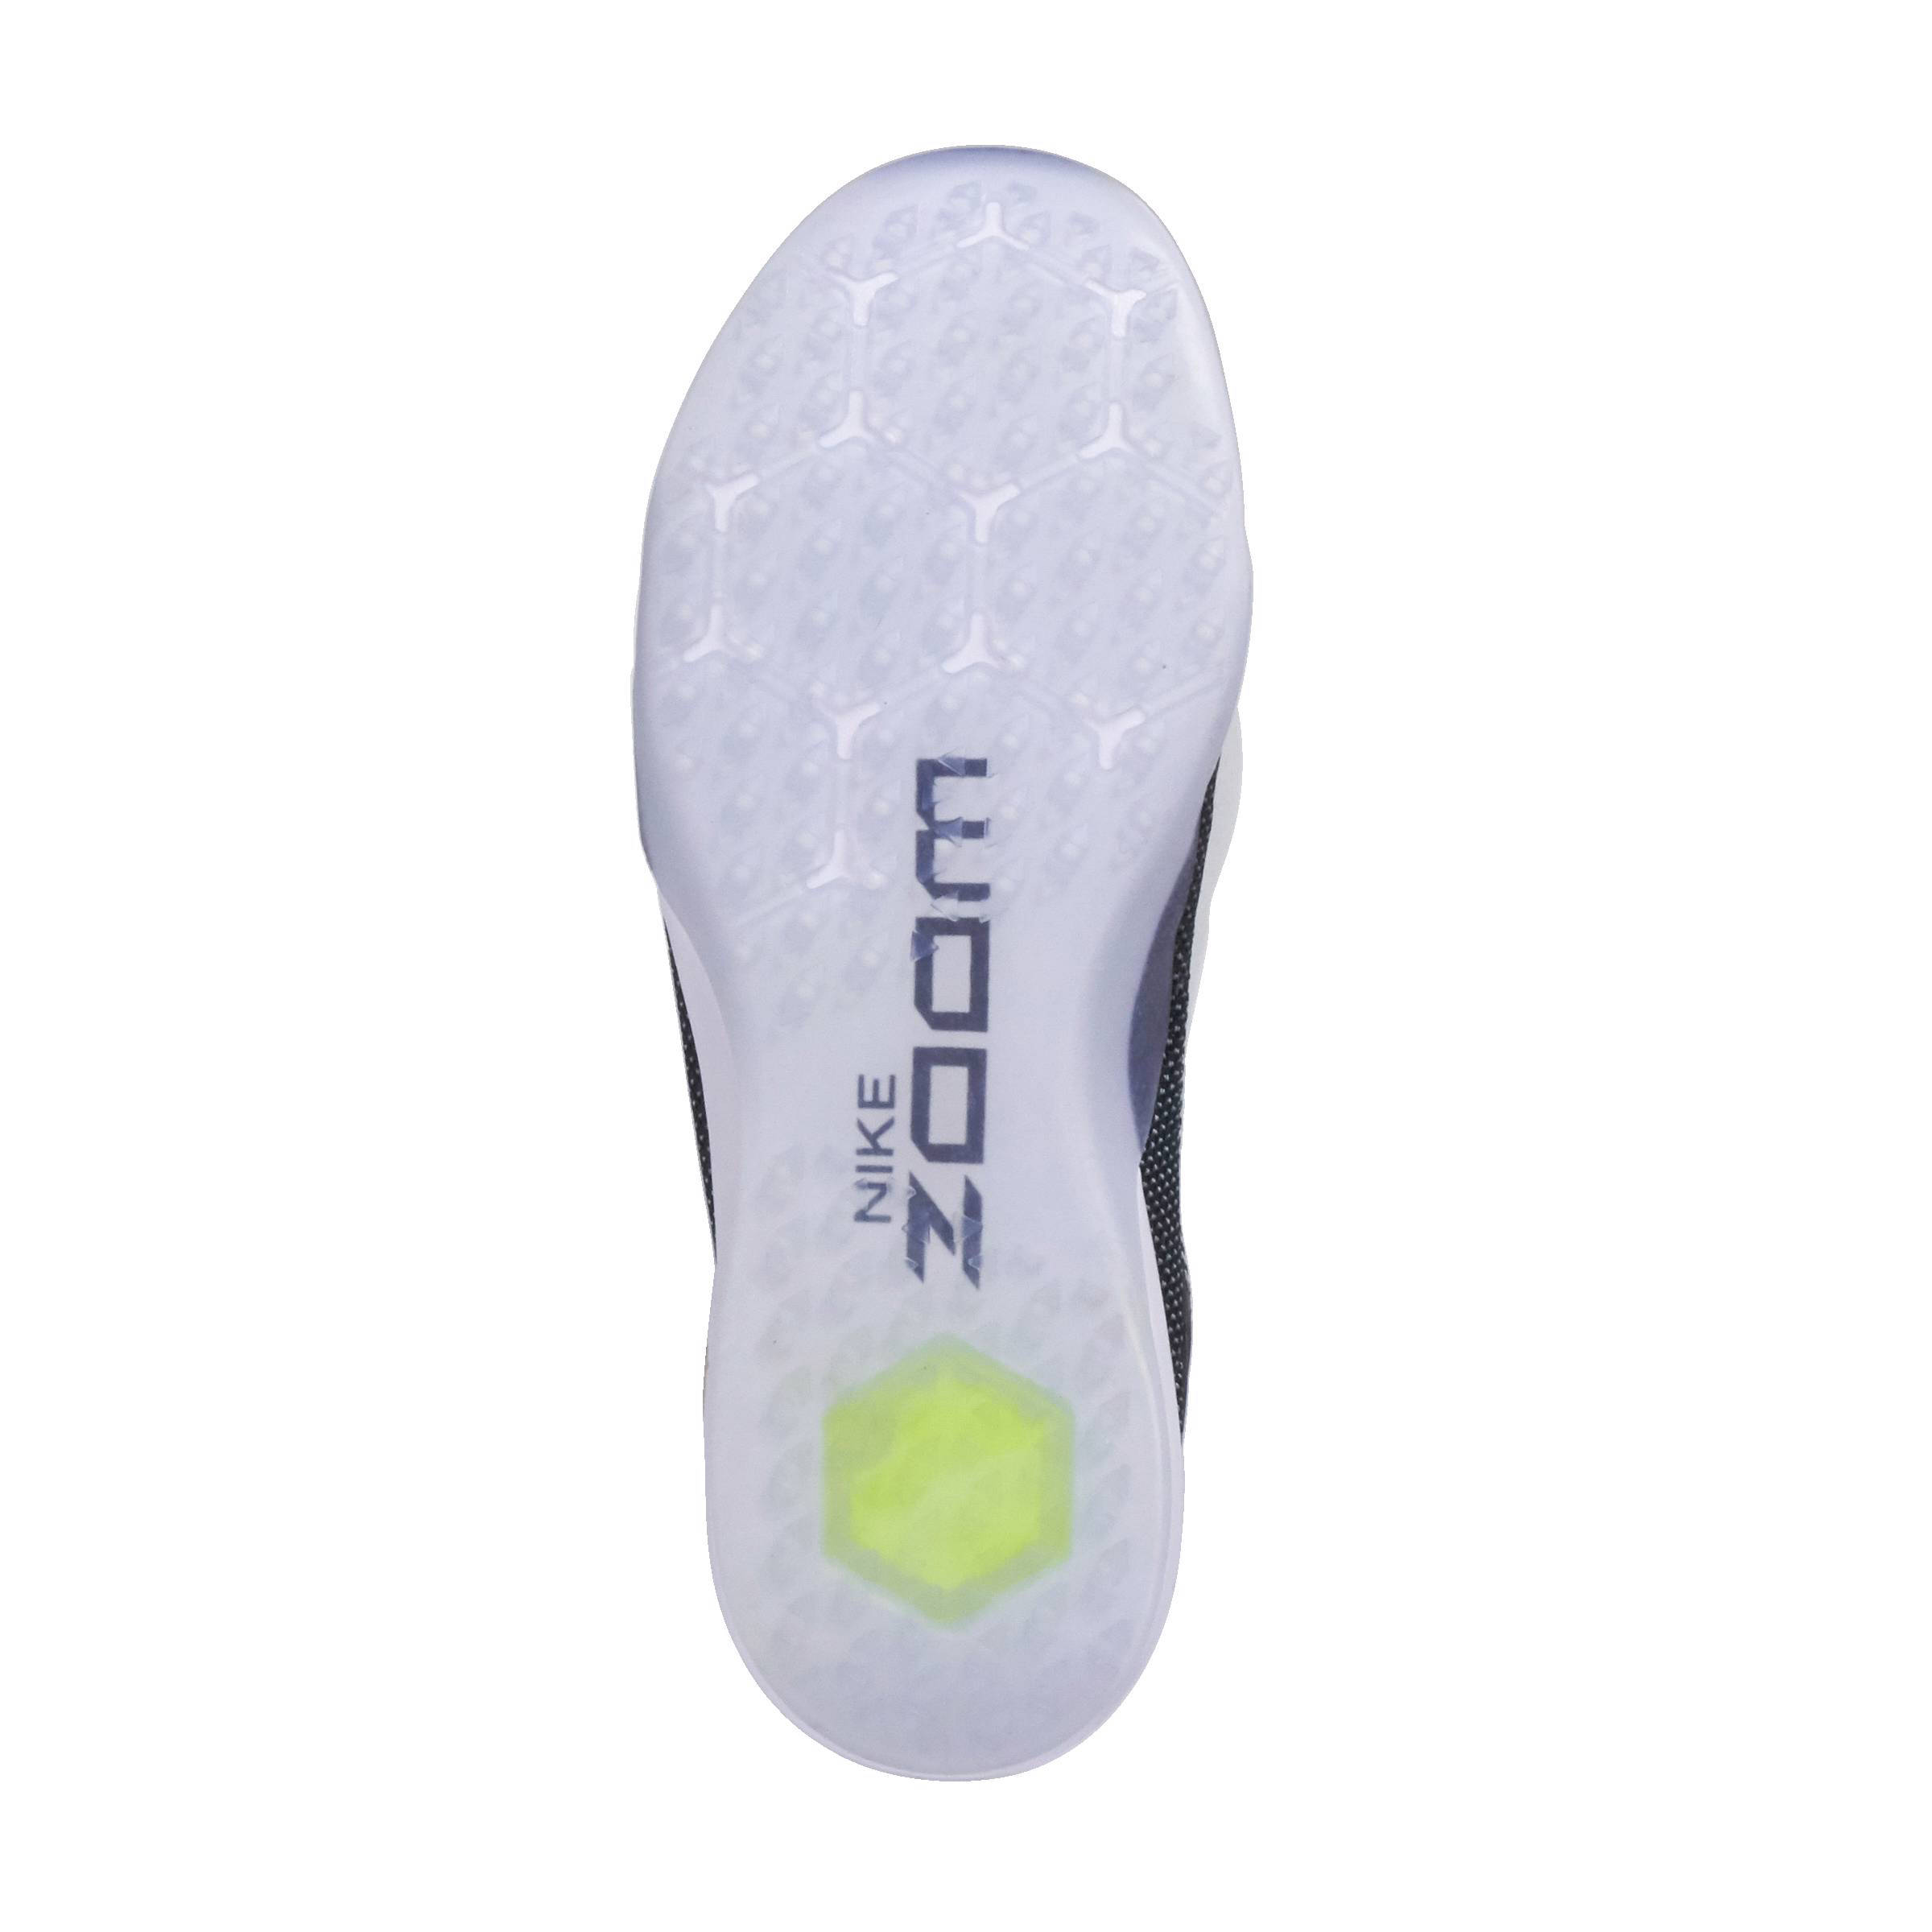 ed2f2d4e85fe8 nike-air-zoom-tr-dynamic-fitness-schoenen-dames-zwart-0675911223611.jpg